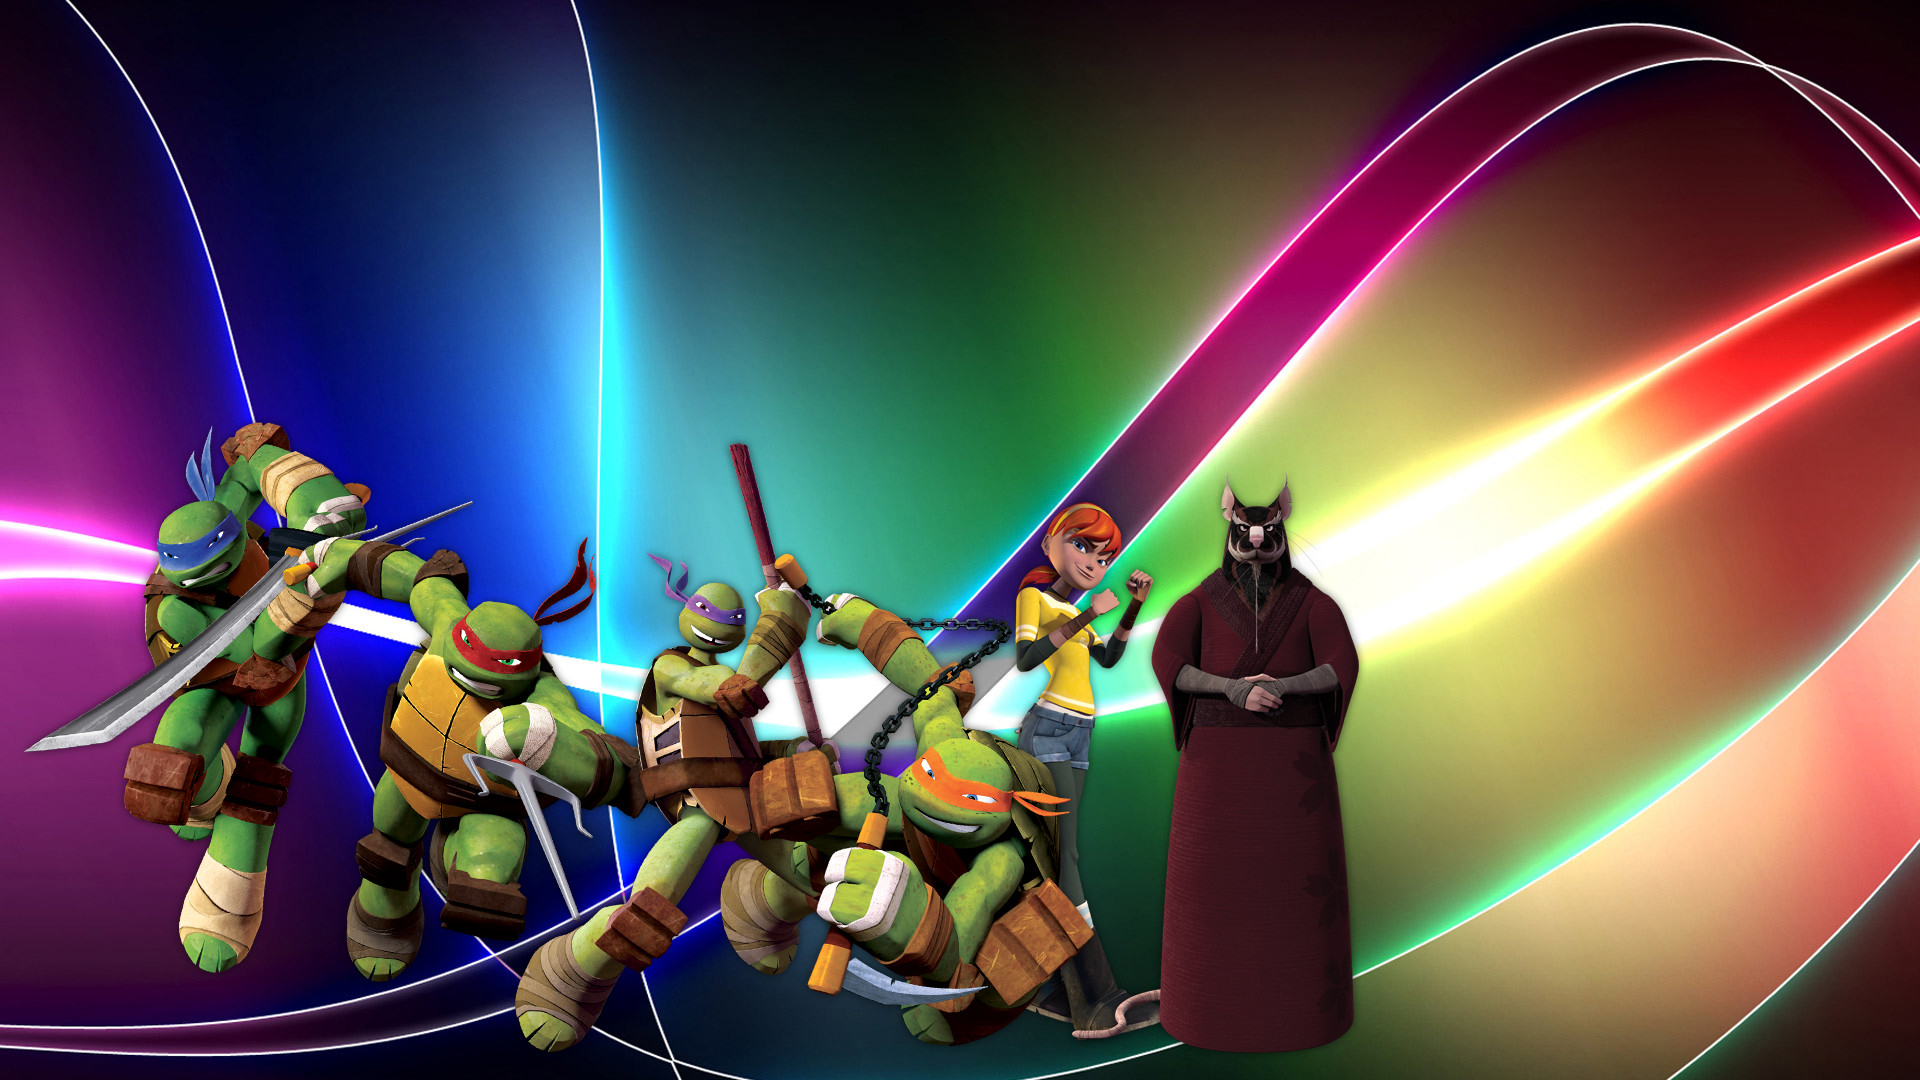 2048x2048 Teenage Mutant Ninja Turtles Idw Comic Ipad Wallpaper Laser Time 05